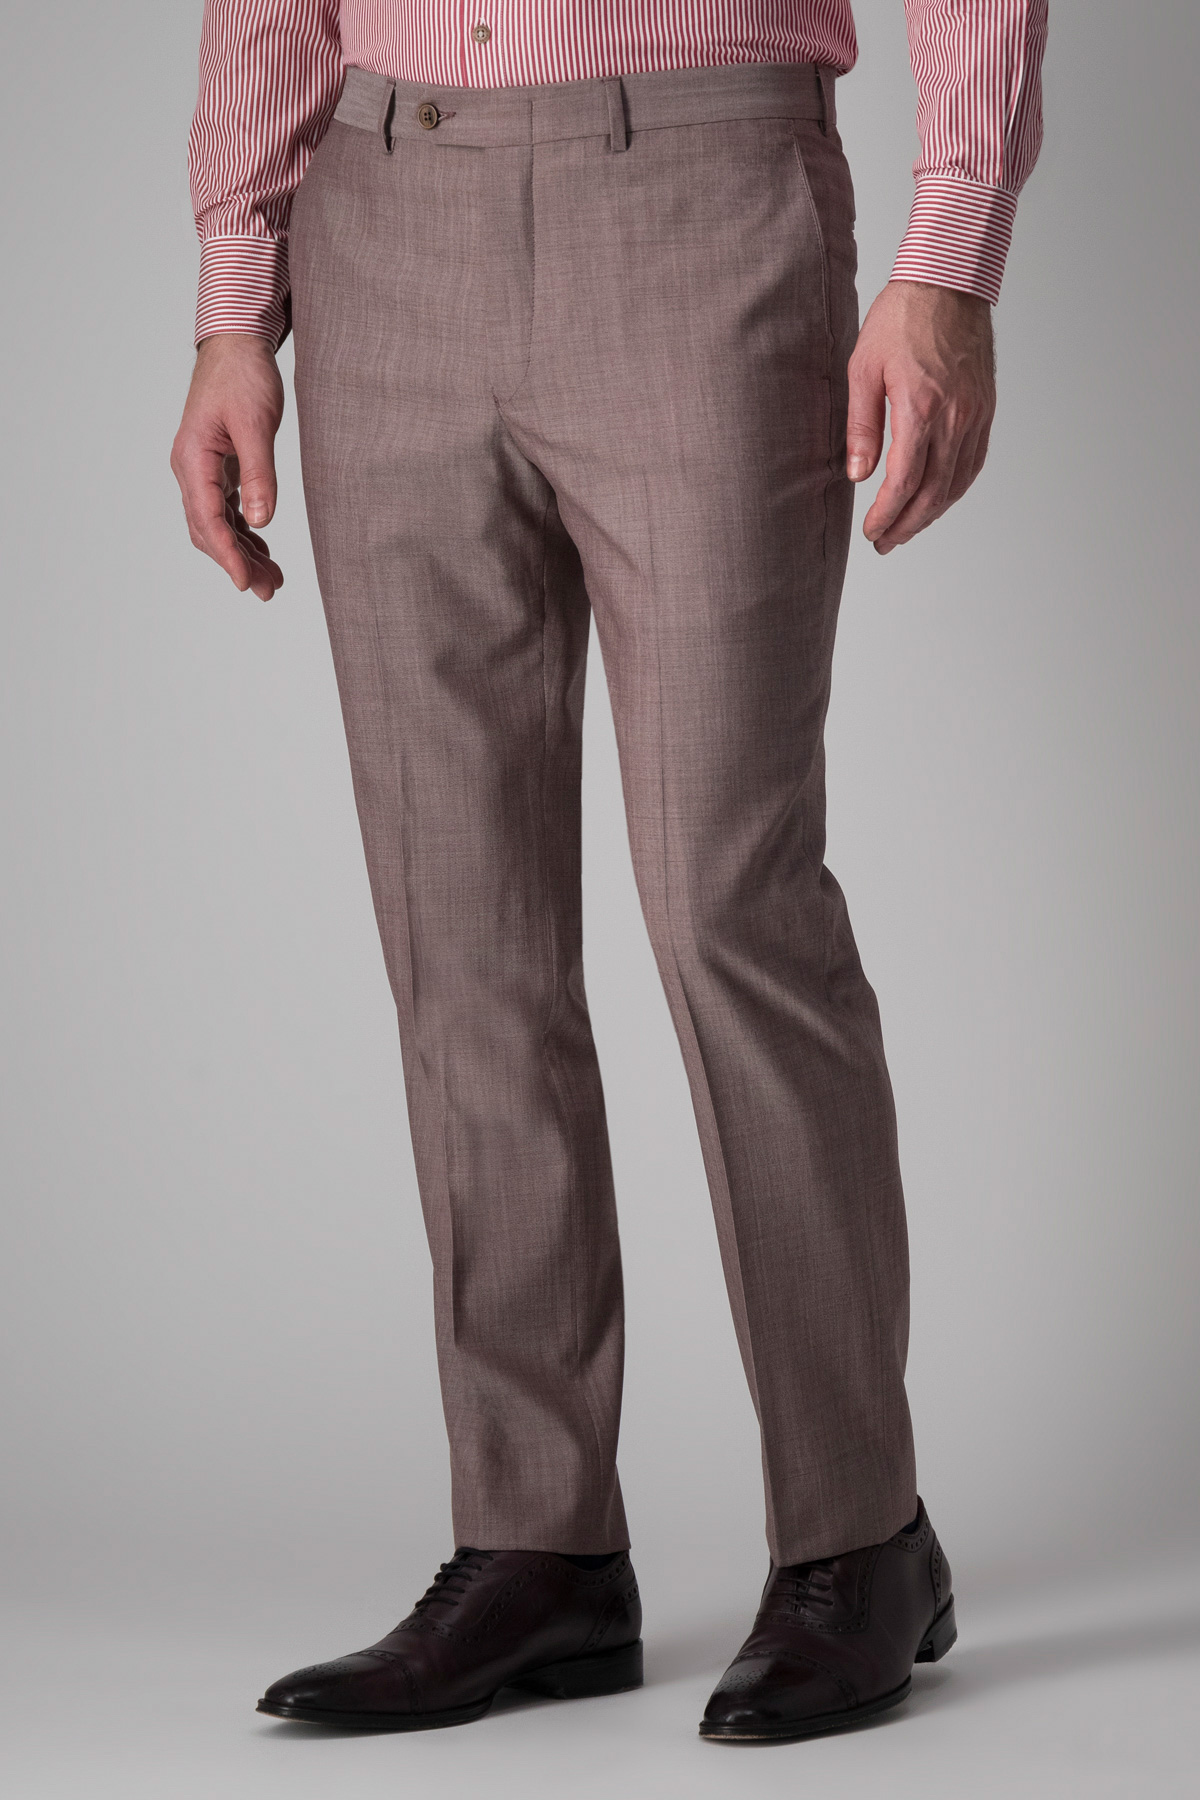 Pantalón Robert´s, 100%lana,  liso color uva melange.